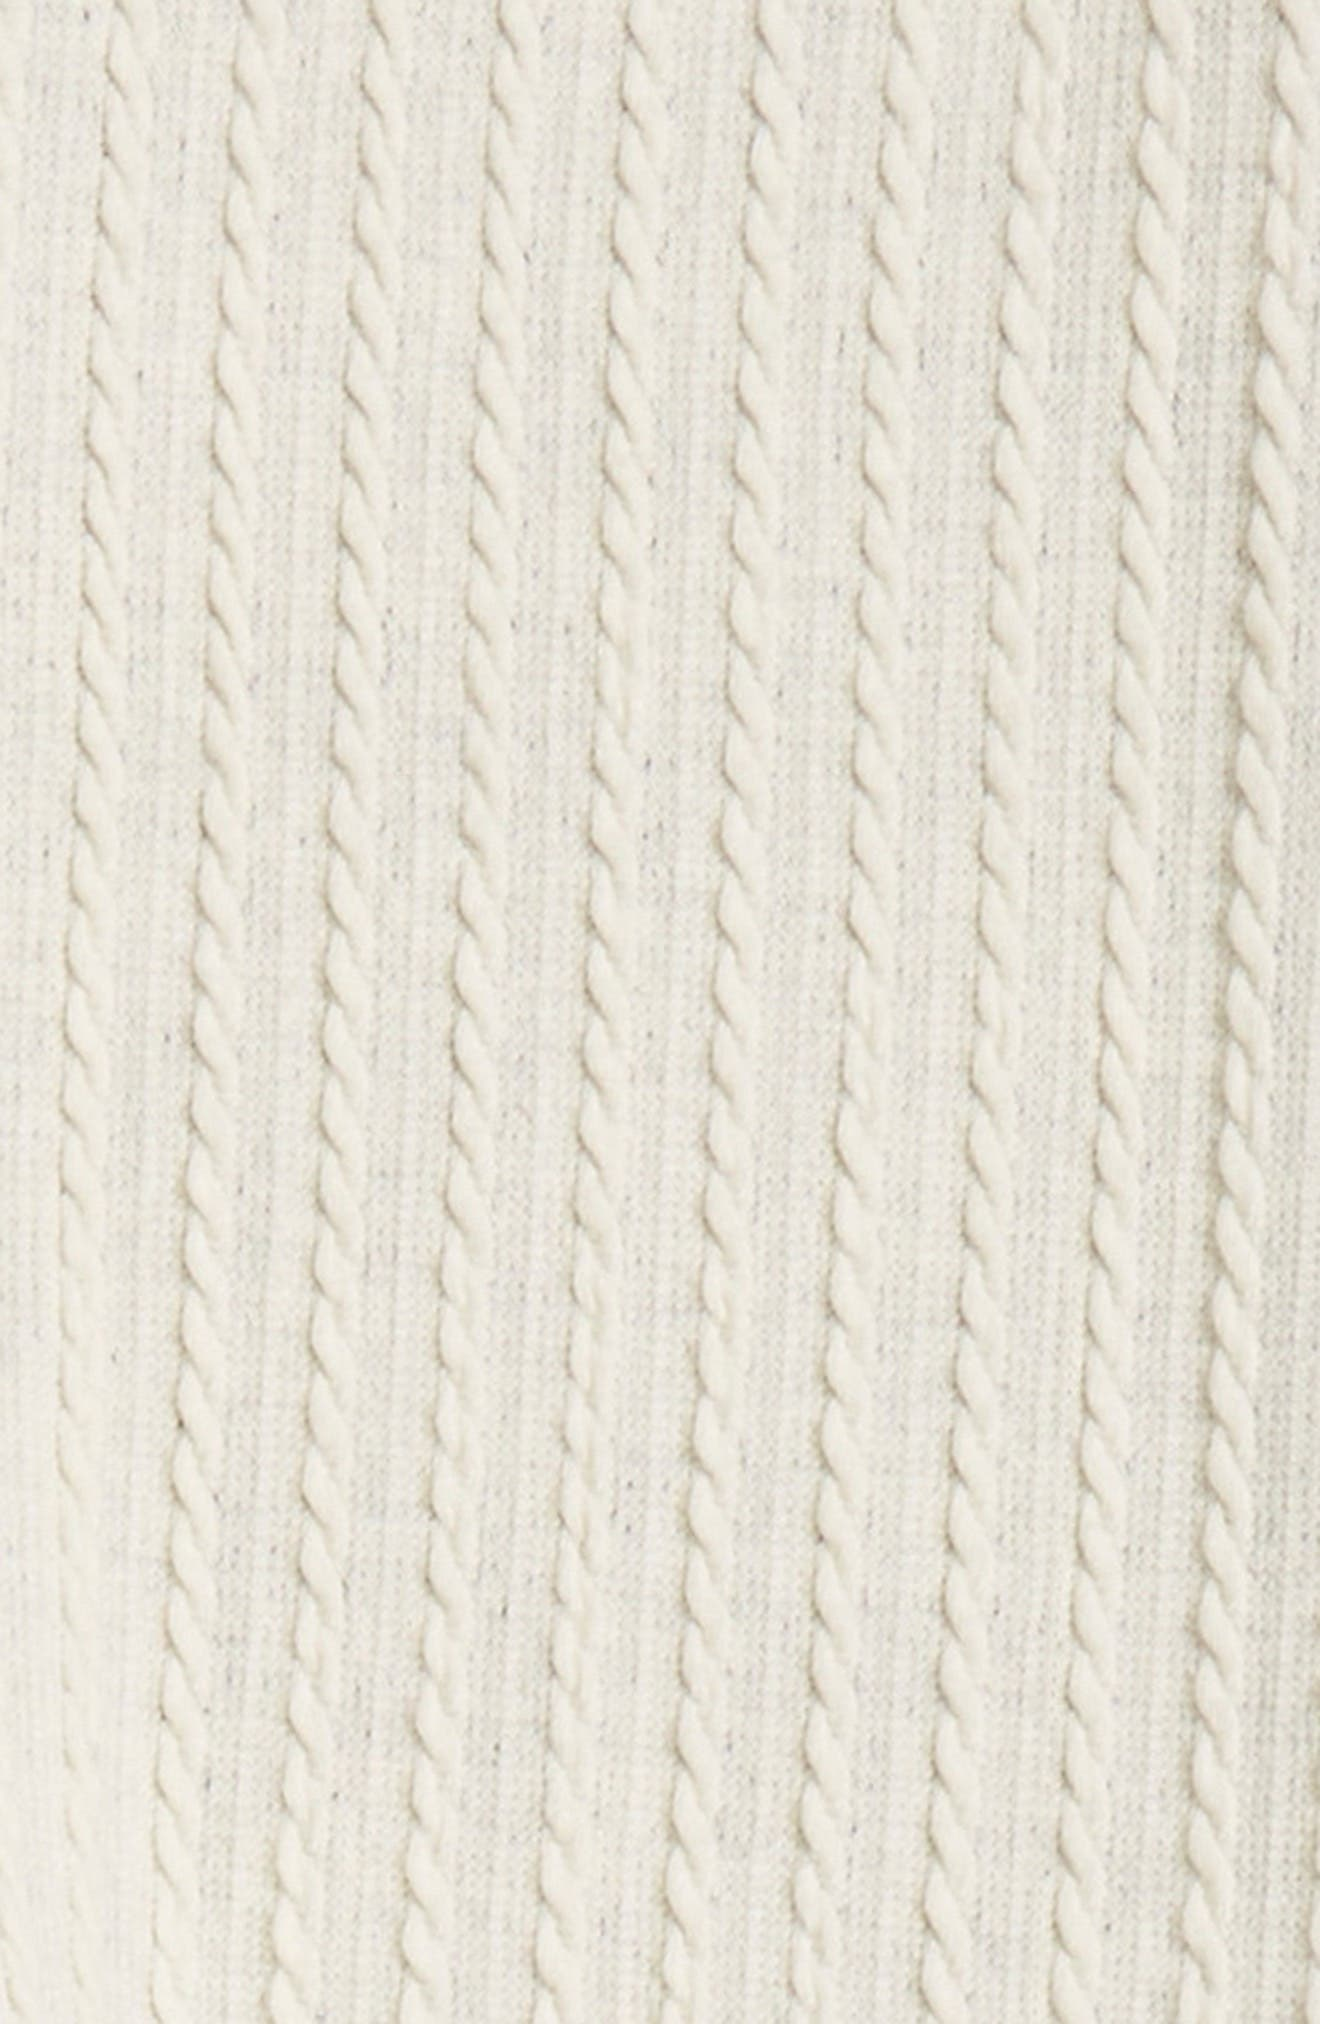 Cable Knit Leggings,                         Main,                         color, IVORY EGRET